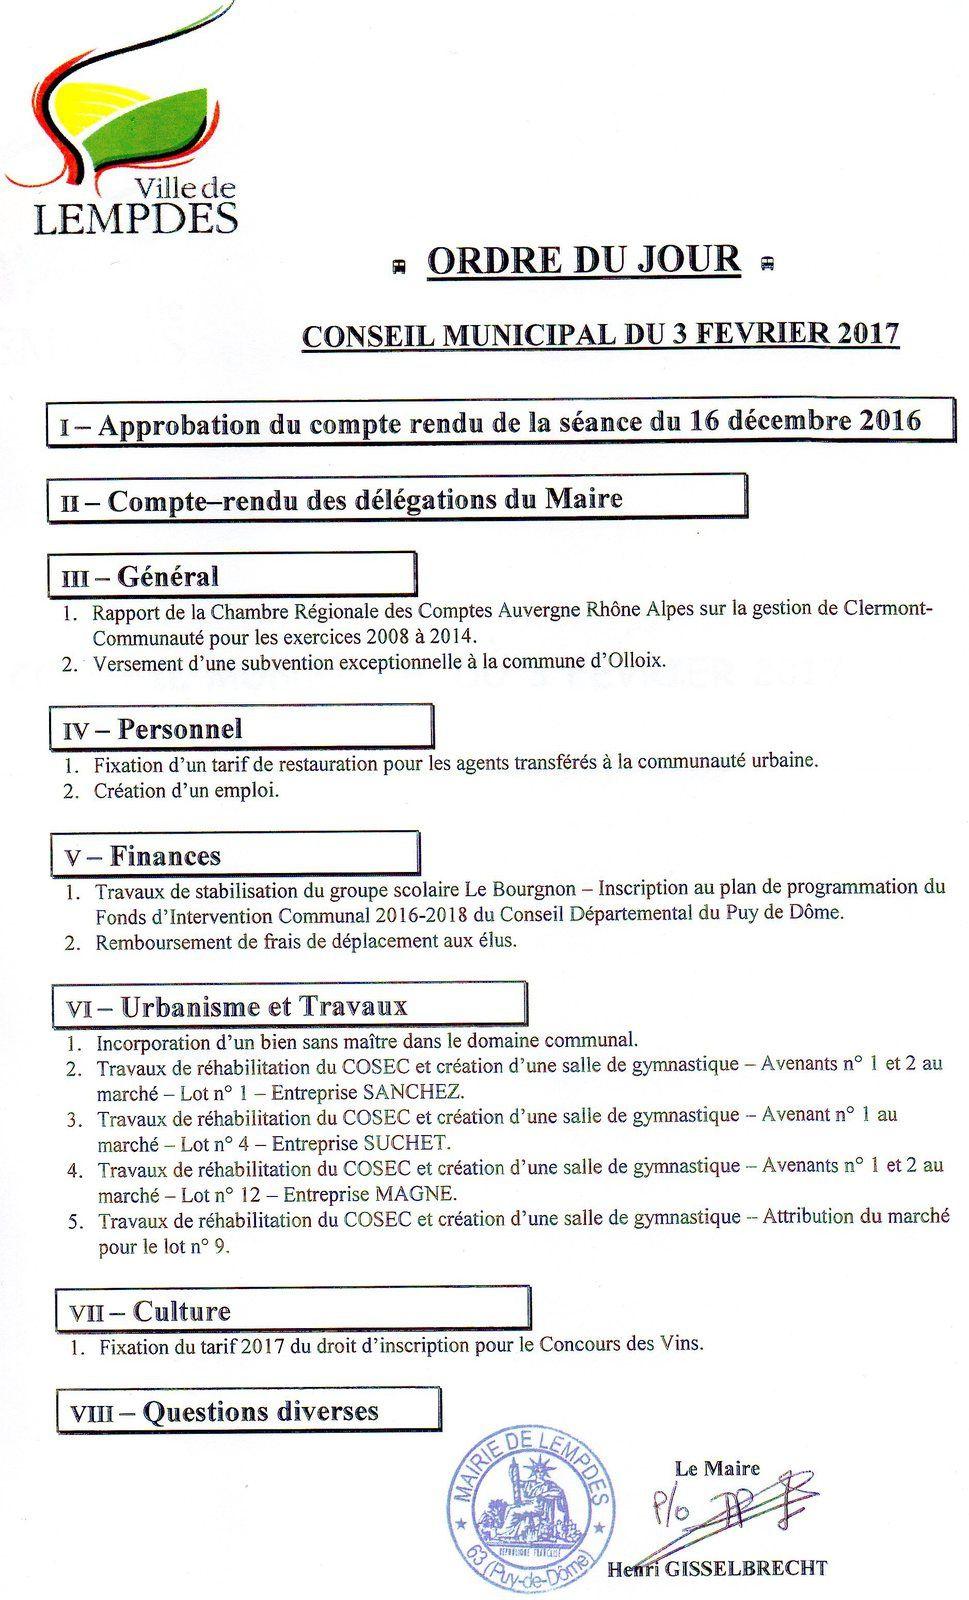 Conseil Municipal 3 Février 2017 19h Salle Voûtée